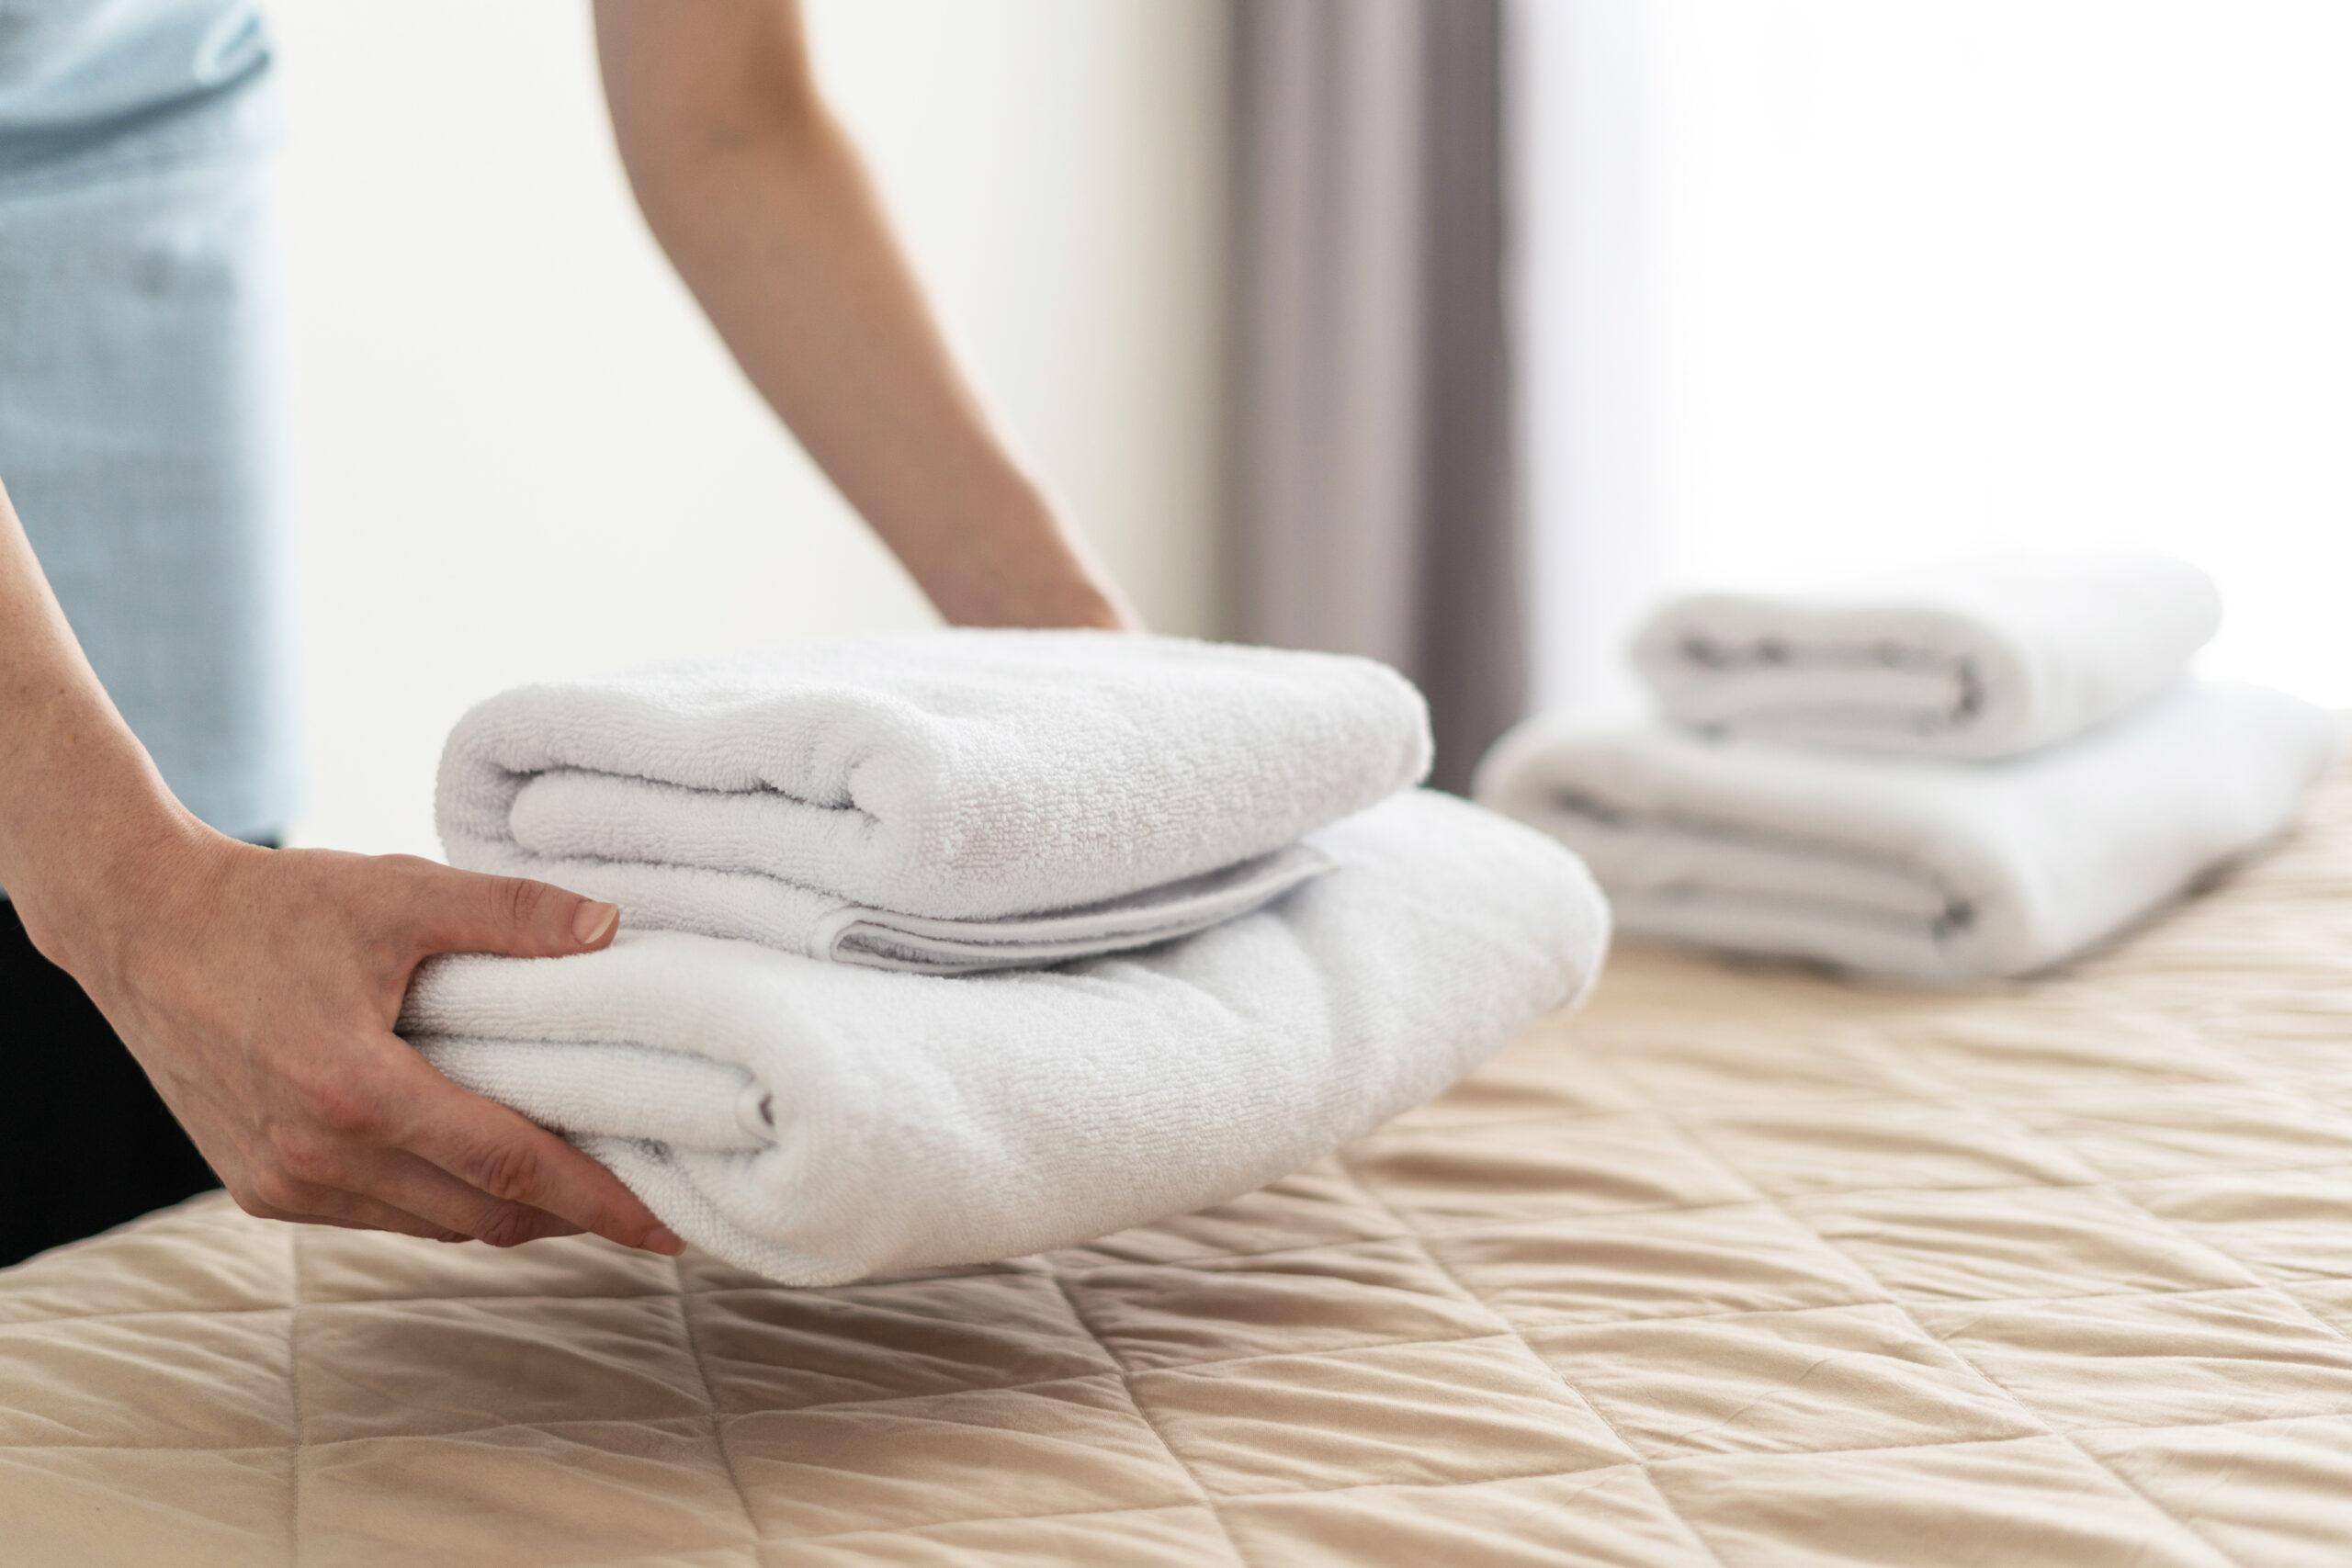 Housekeeper replacing linens